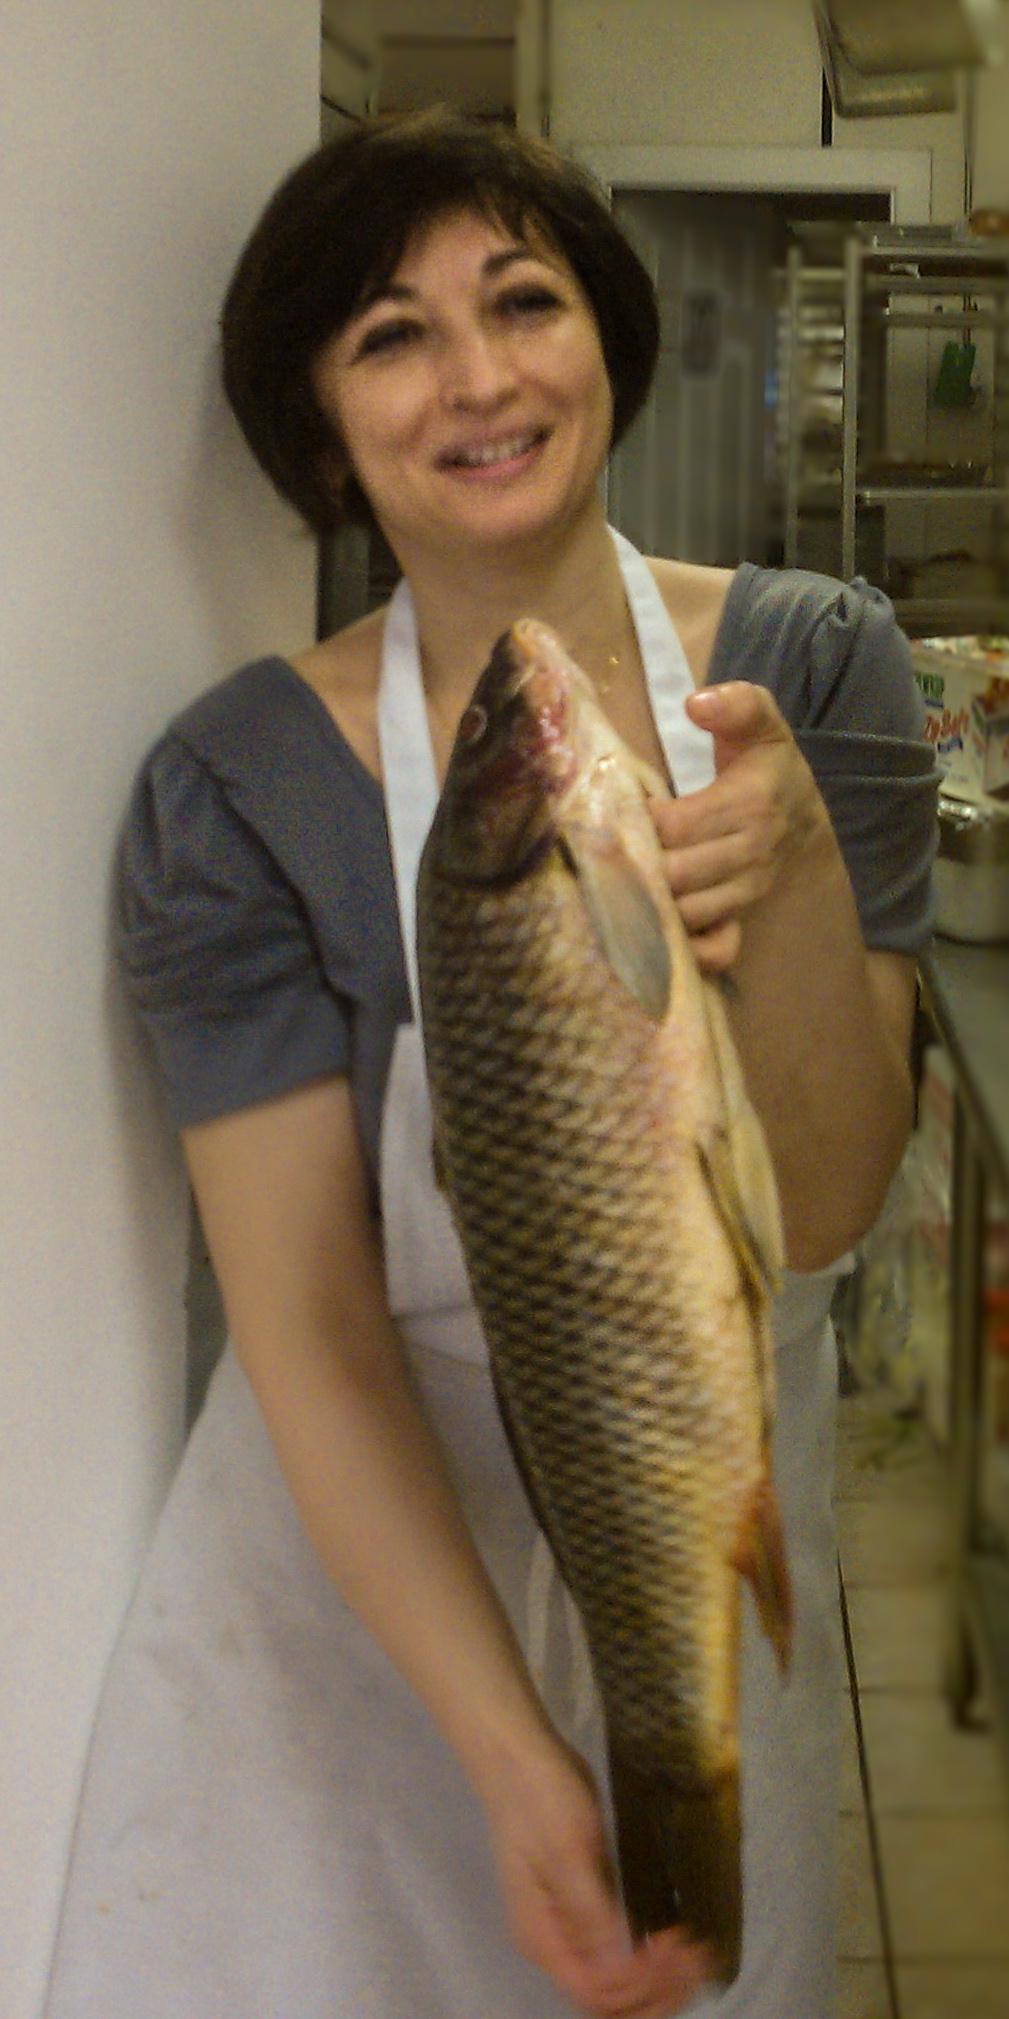 Pre-gefilte fish